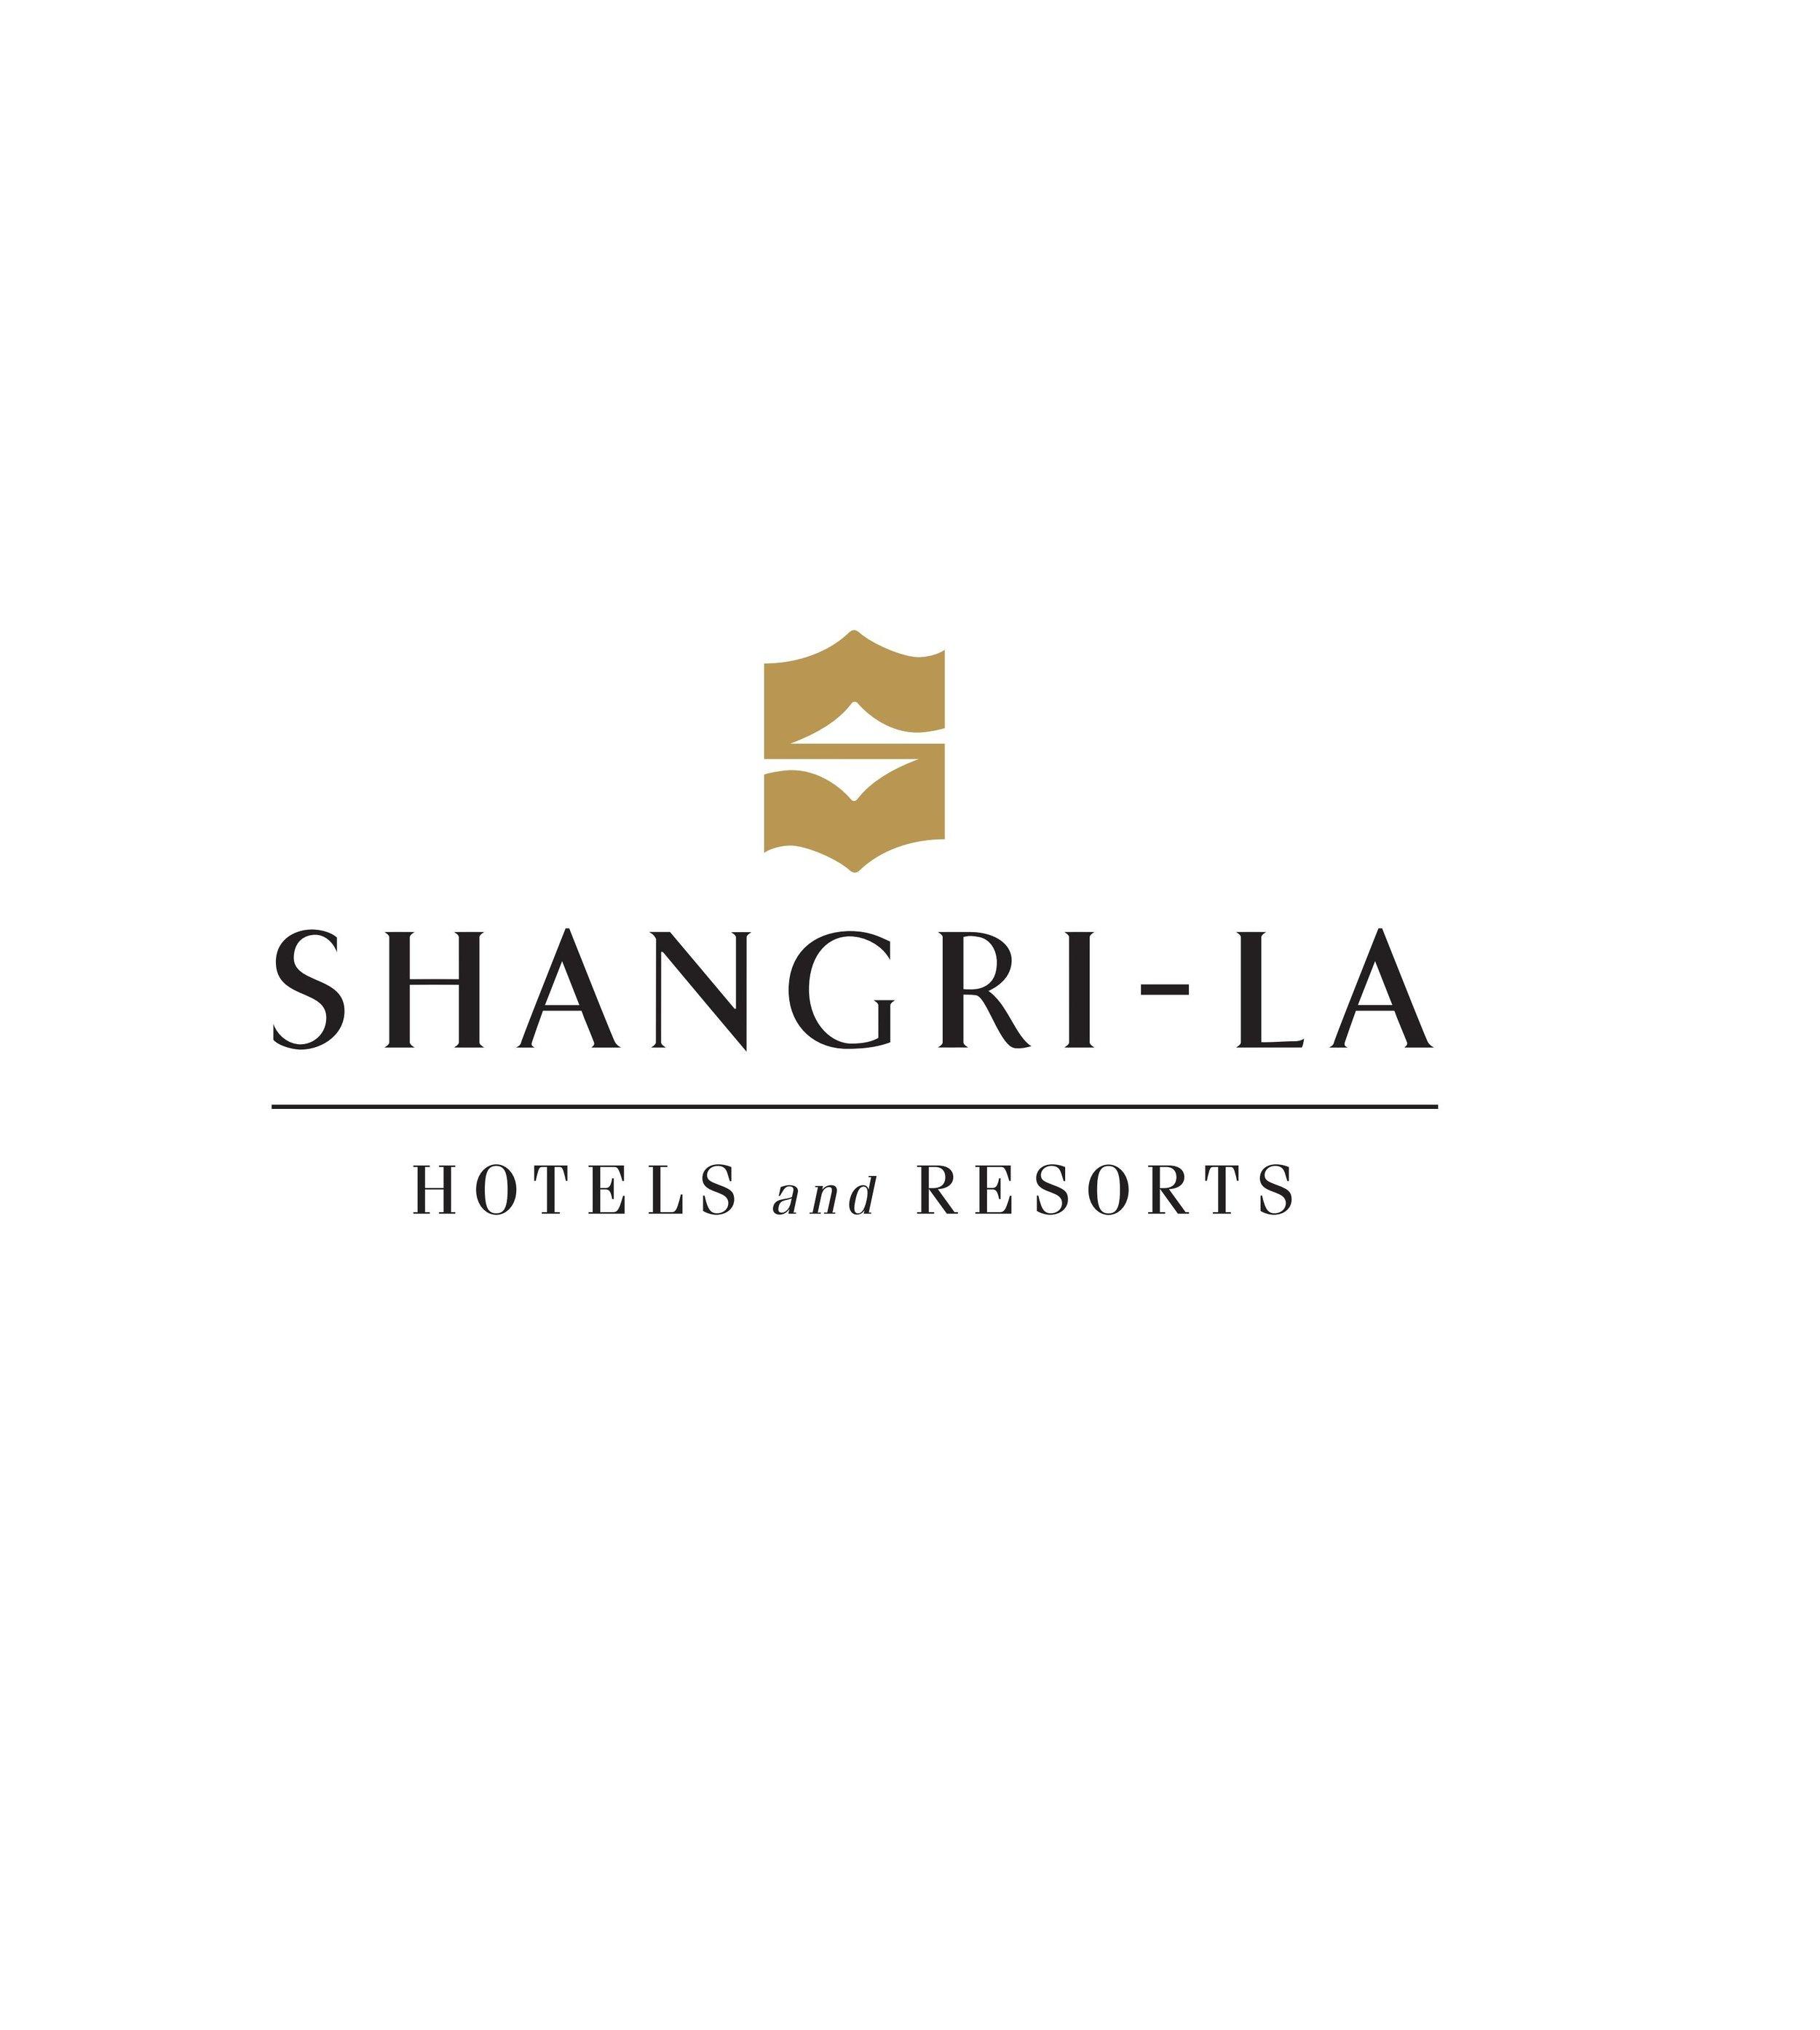 Shangri La Logo.jpg